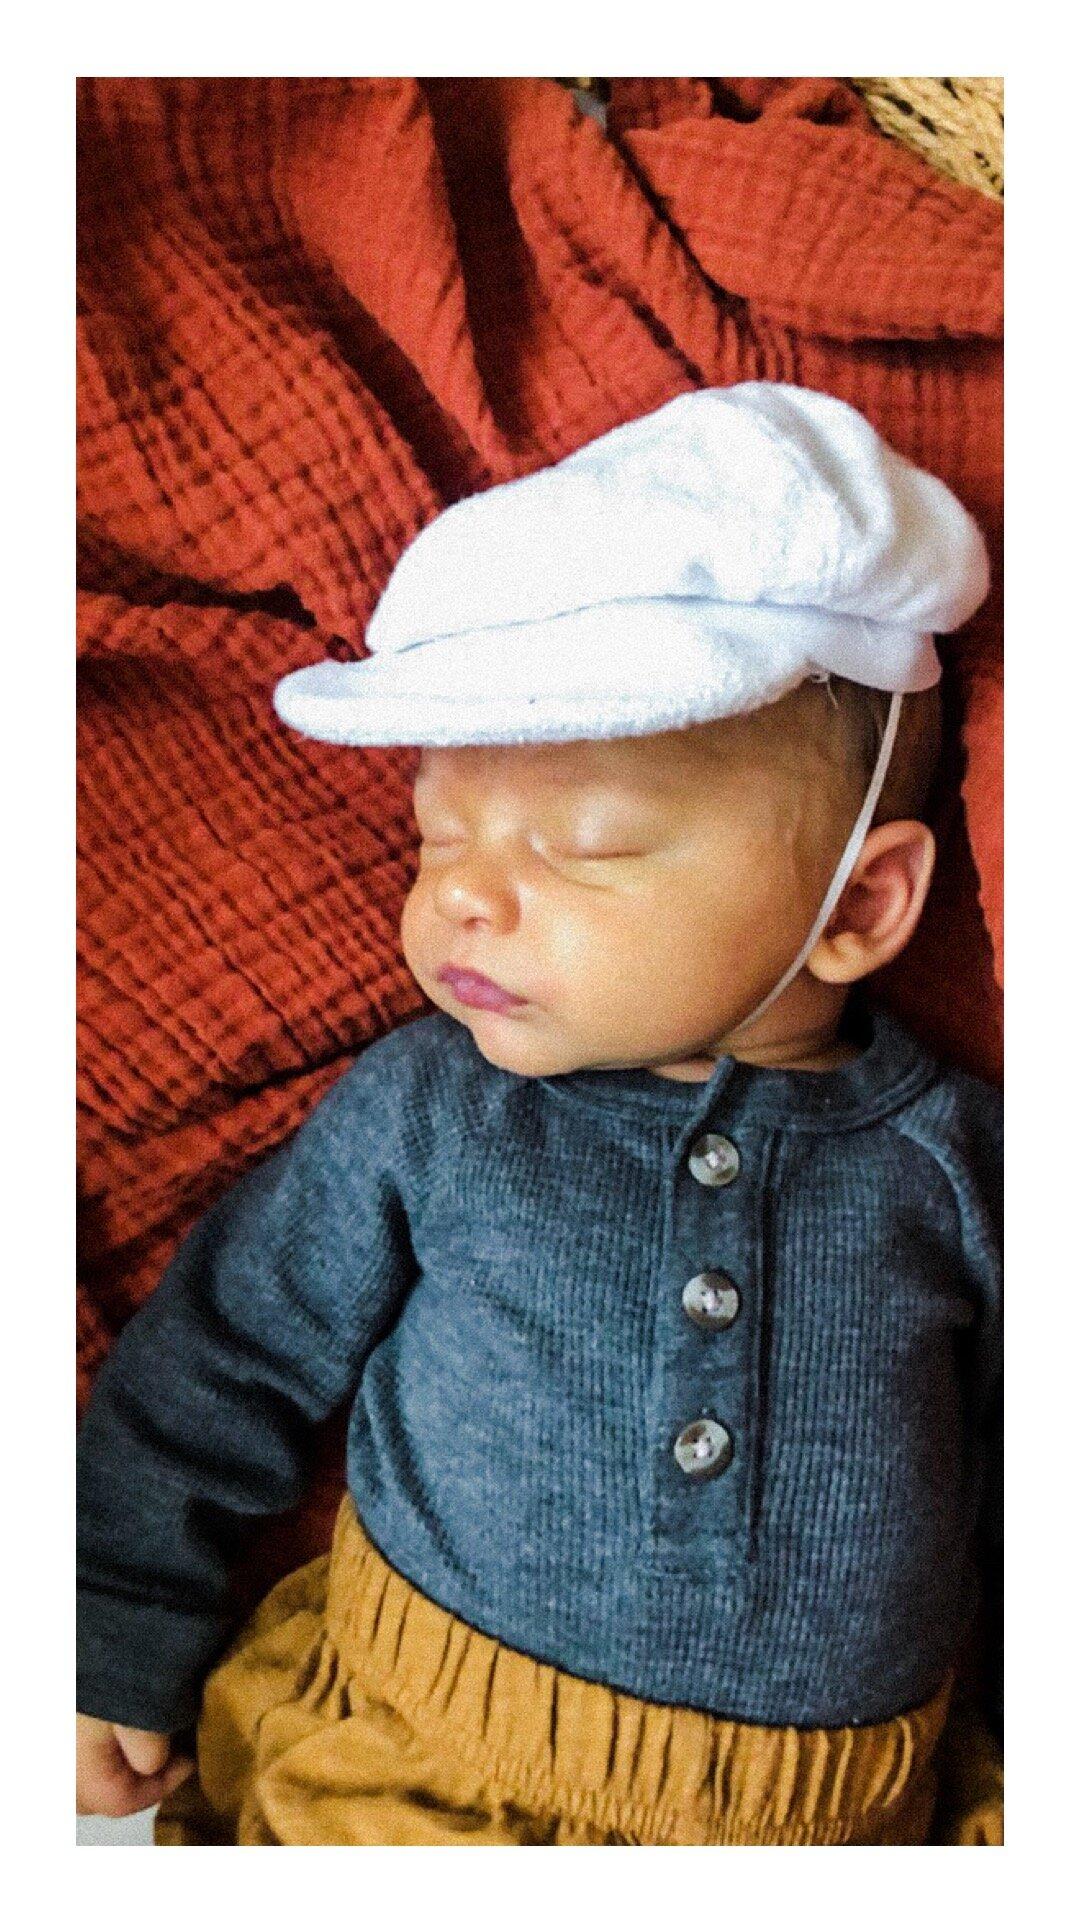 Newborn in a white hat. Photos taken via FaceTime